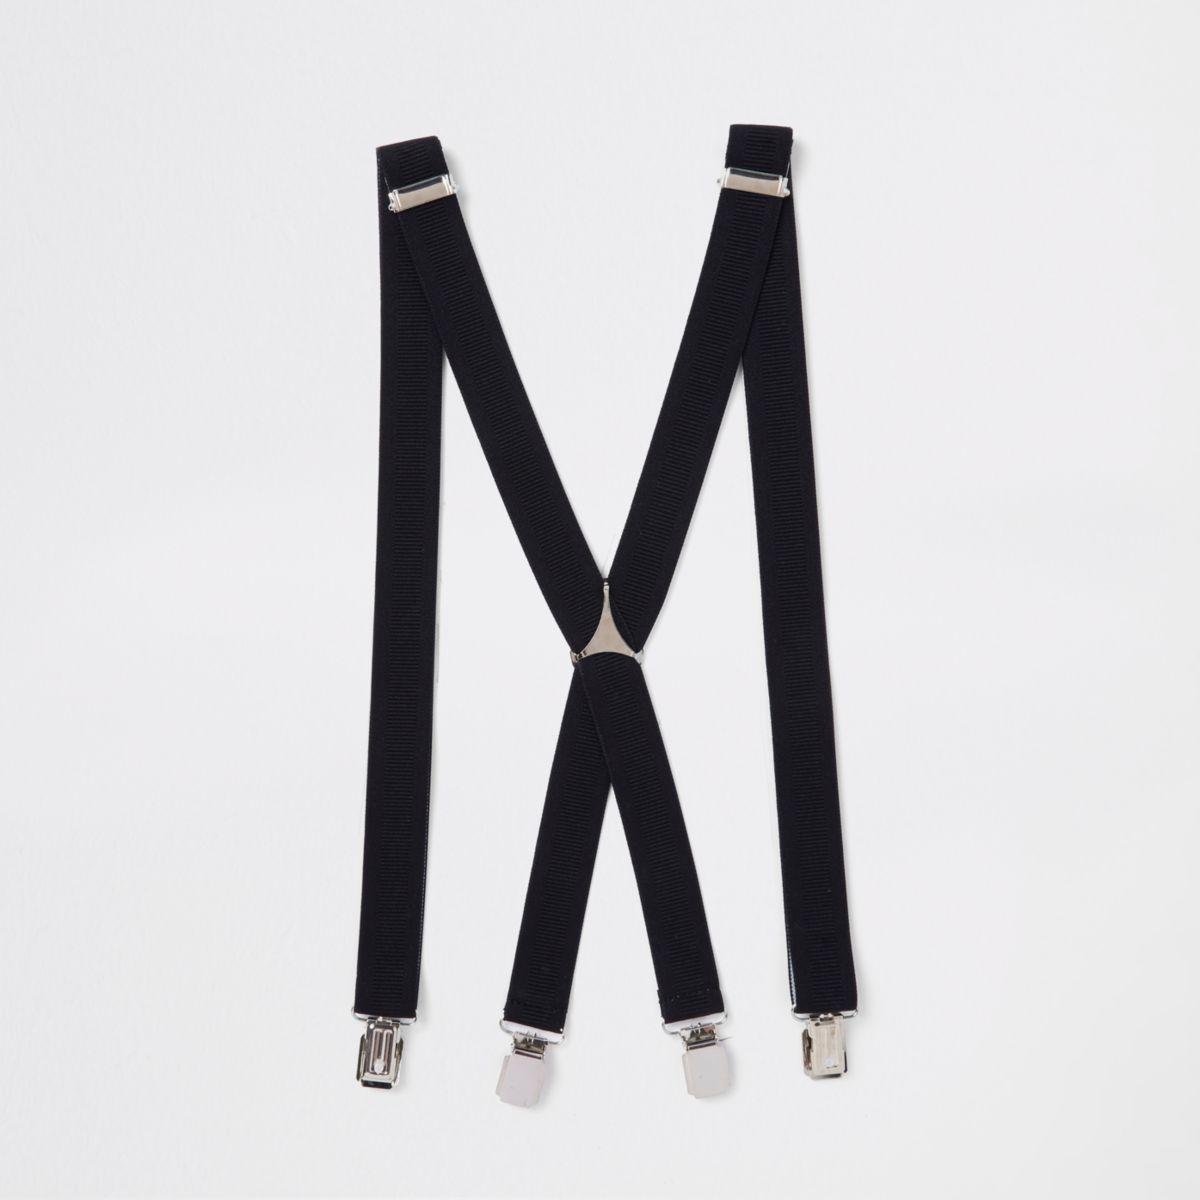 Black belt suspenders